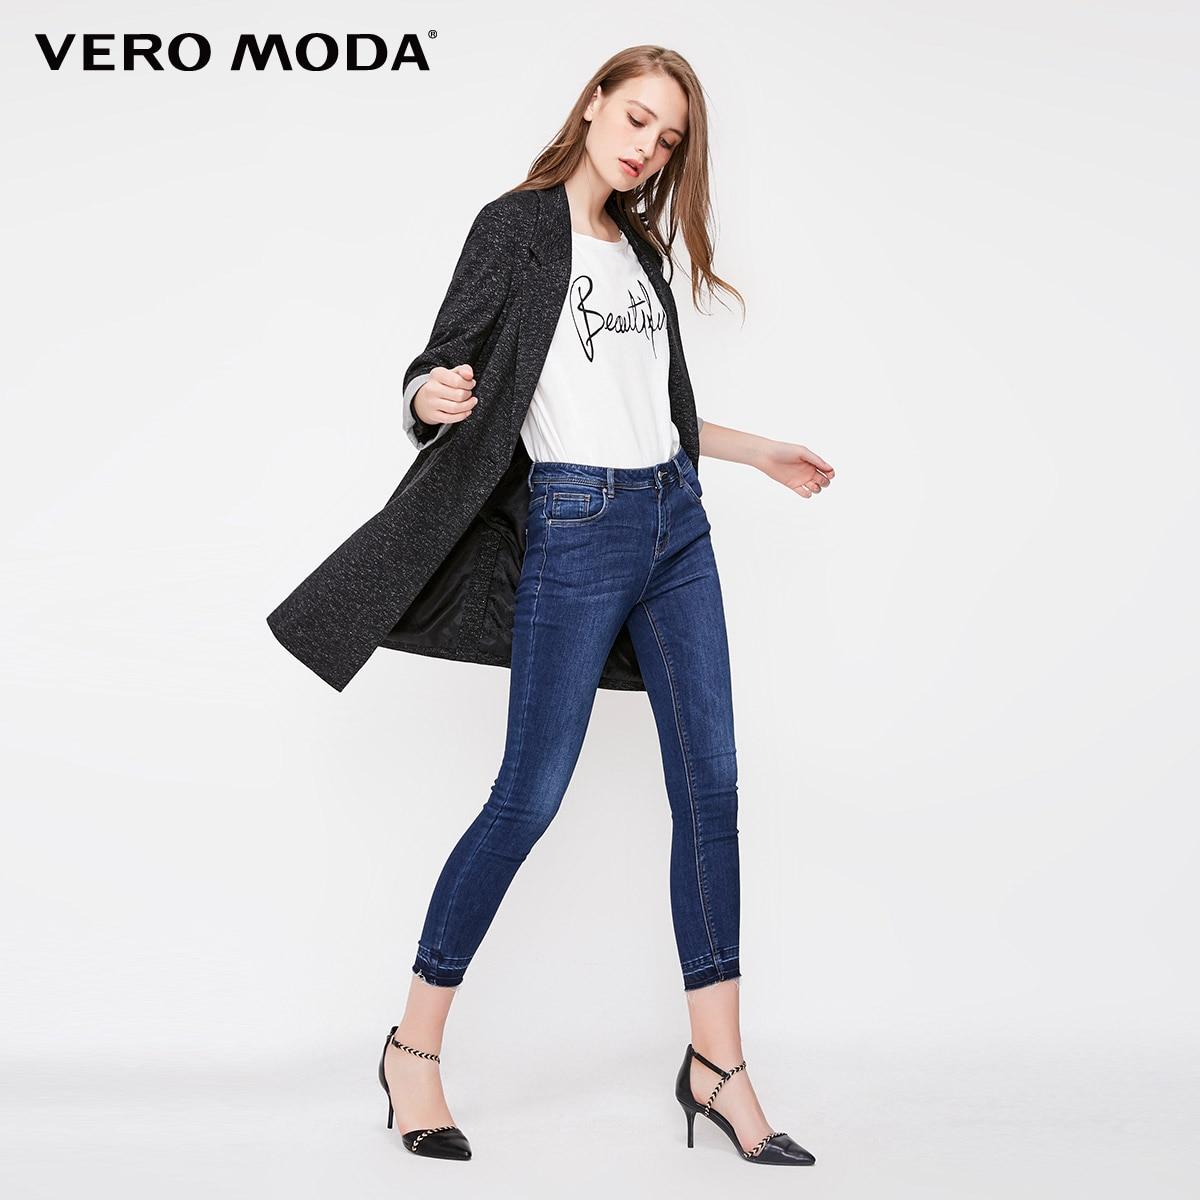 Vero Moda Women's Slim Fit Medium Length Single-Button Long Jacket Blazer 318308502